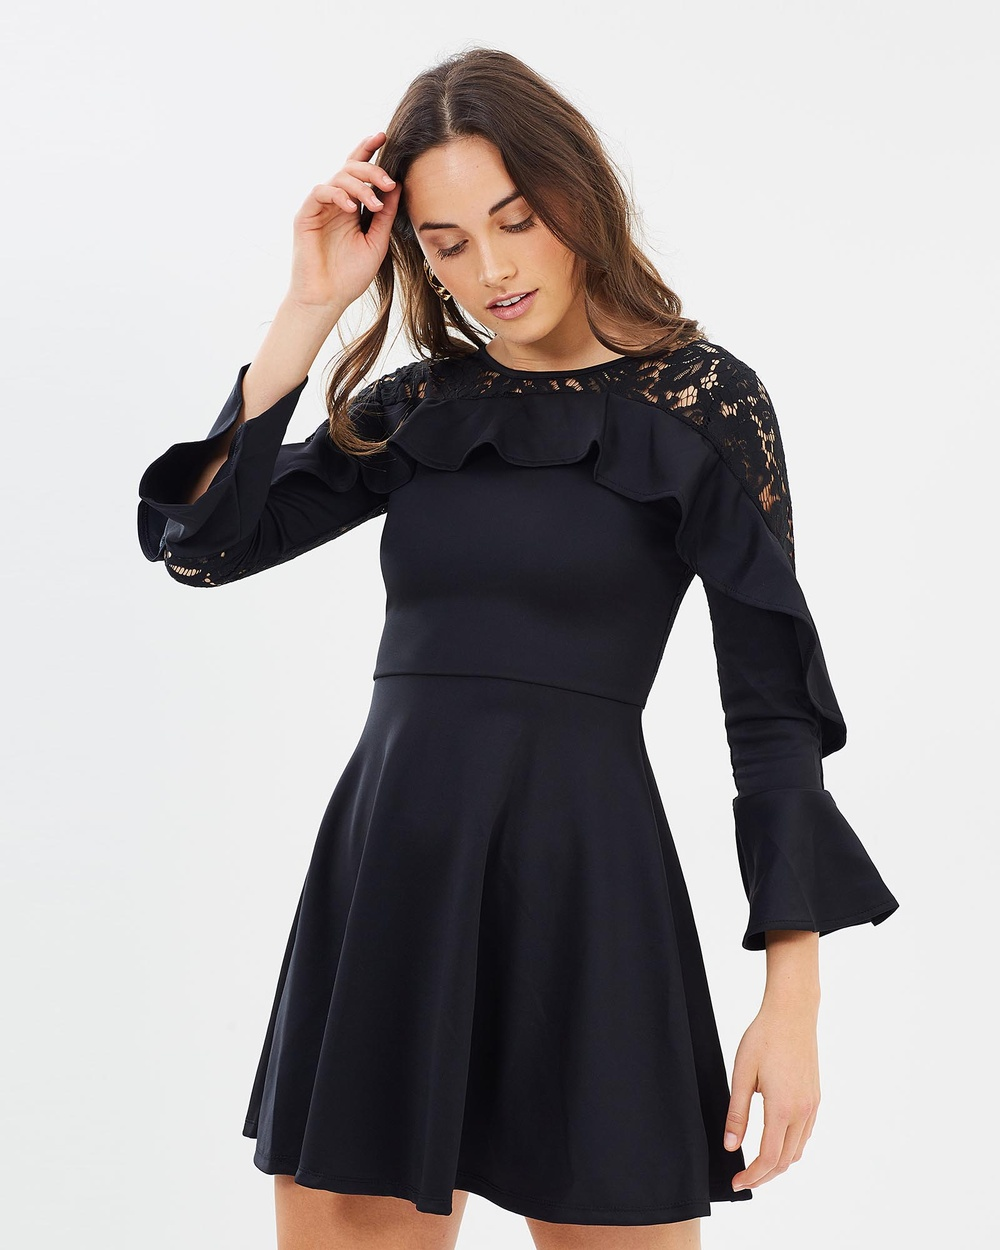 ROXCIIS Black Mica Cocktail Dress